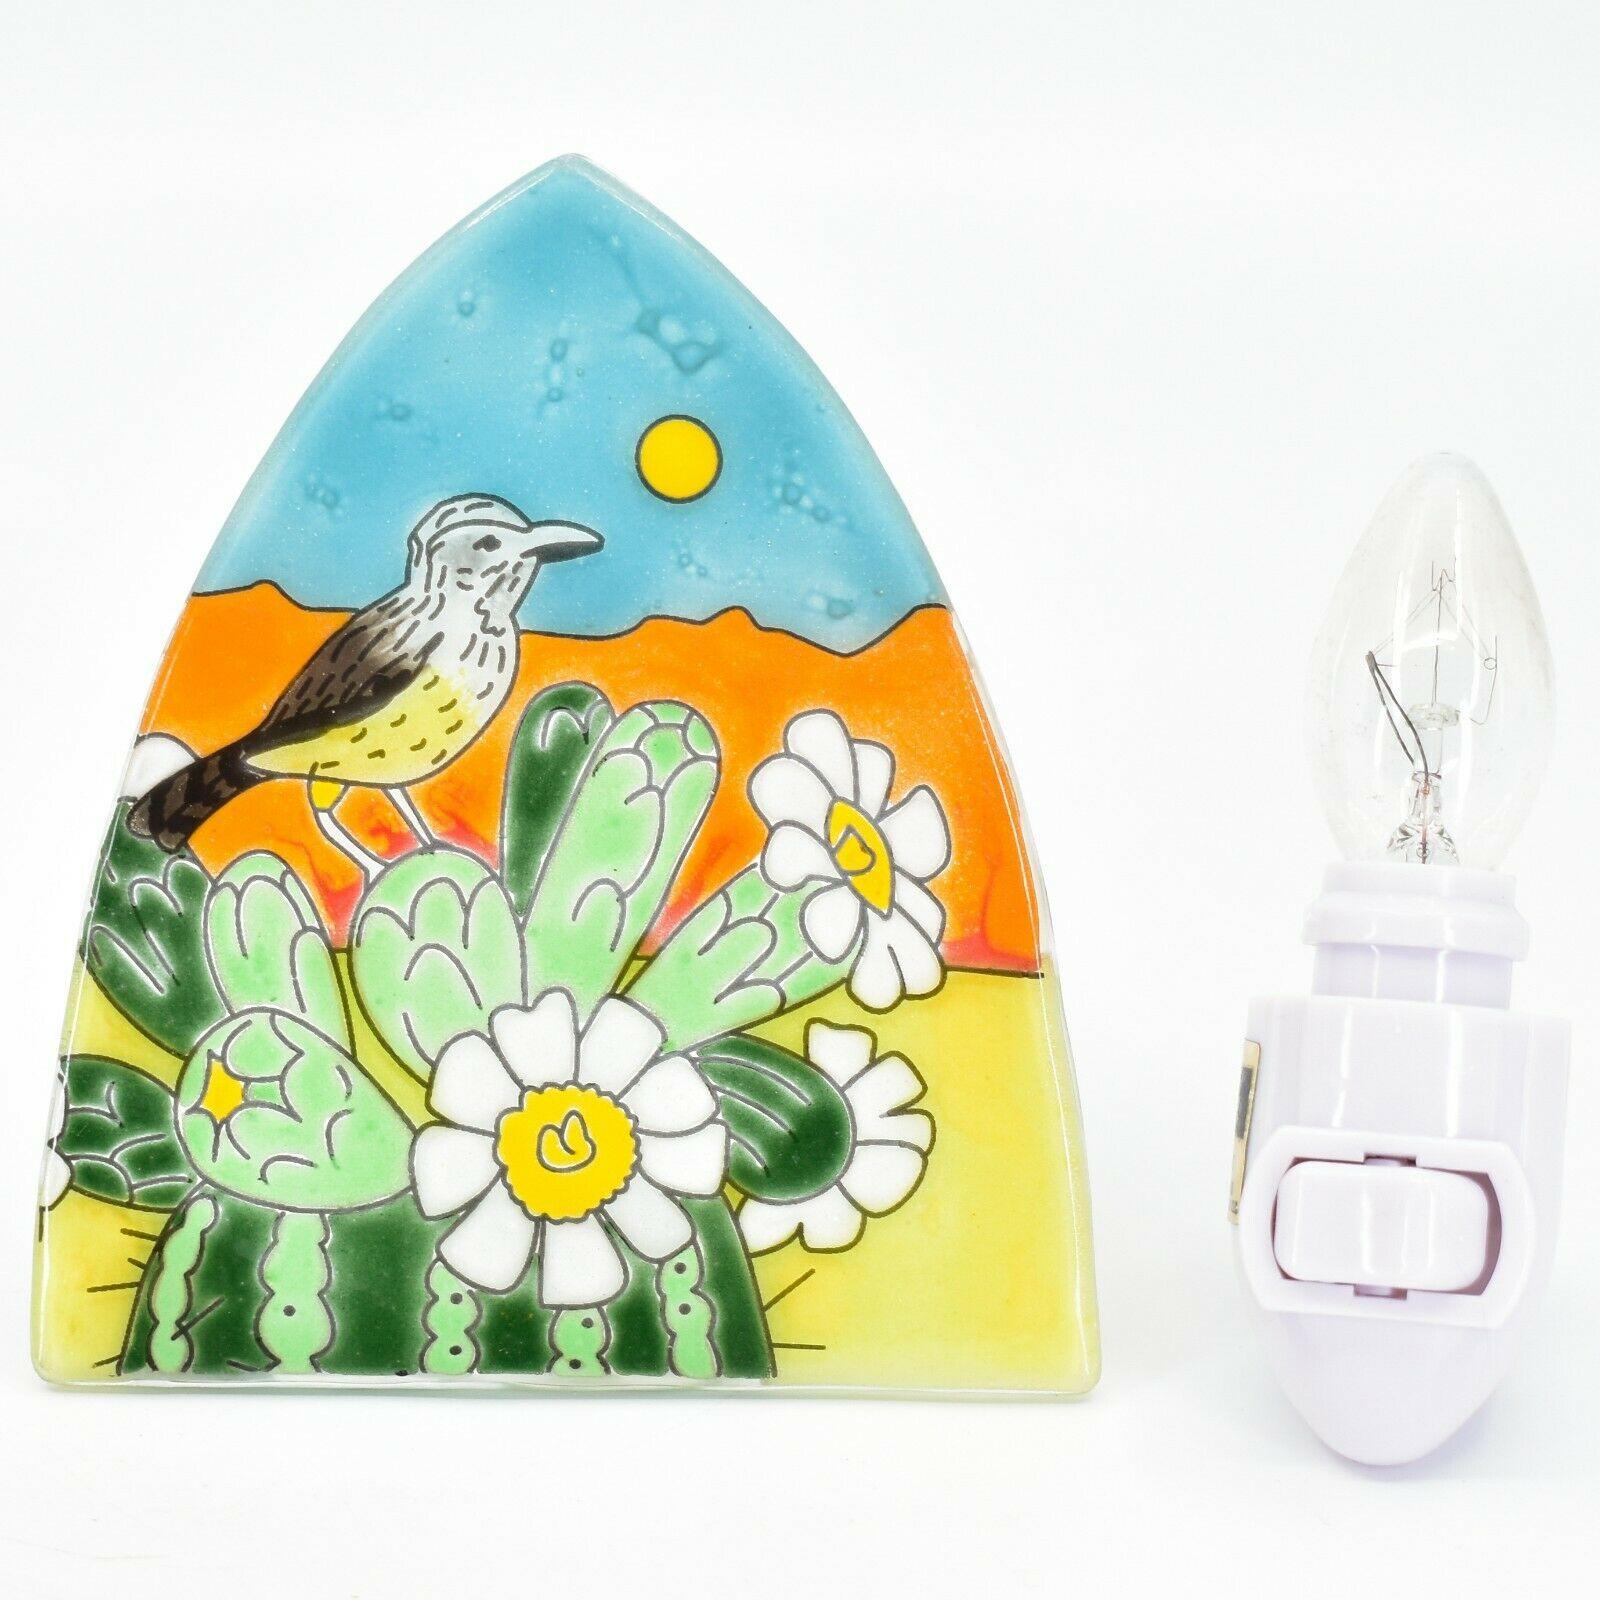 Fused Art Glass Desert Cactus Sunset Nightlight Night Light Handmade Ecuador